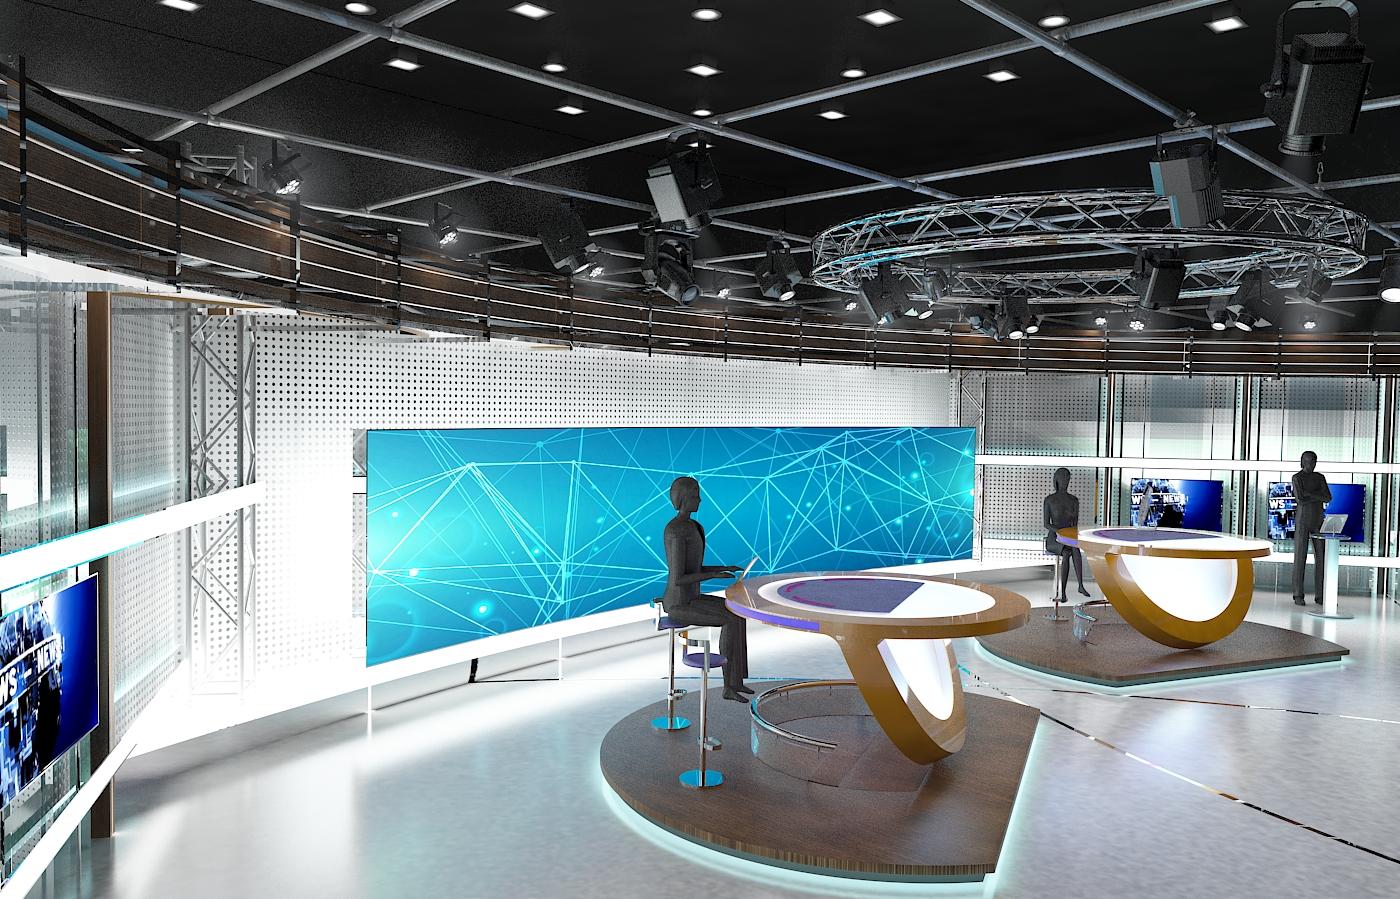 виртуал телевизийн студи цуглуулга vol 6 3d загвар max dxf dwg fbx obj 223401